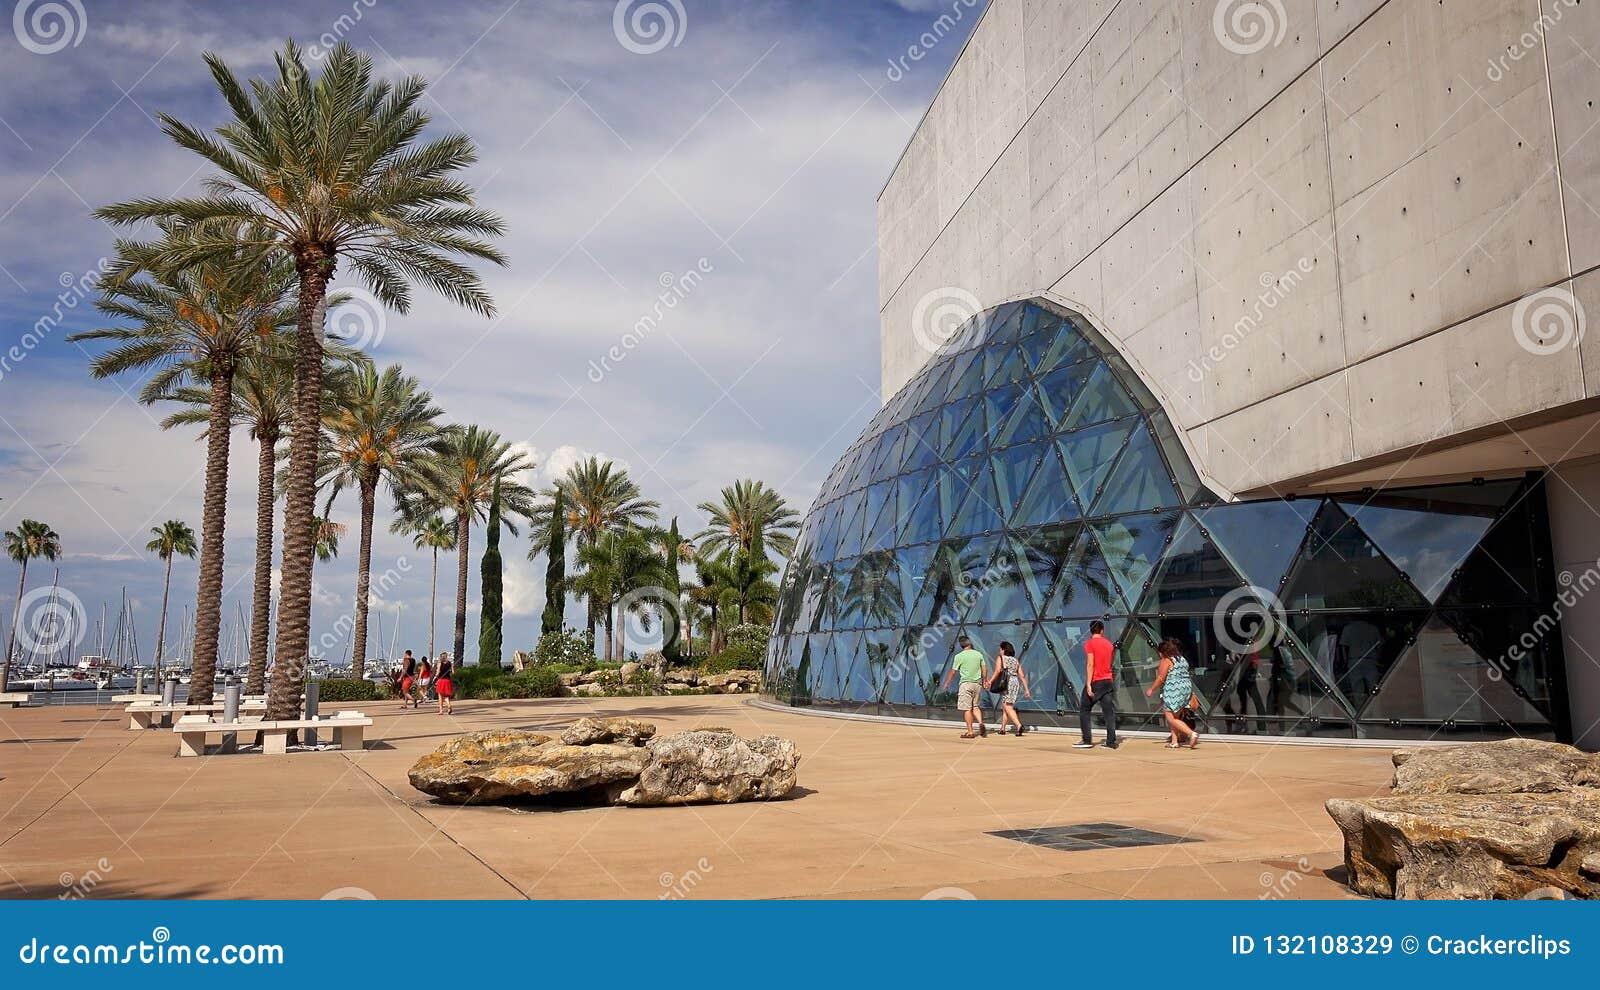 Toeristen in Salvador Dali Museum in St. Petersburg, Florida